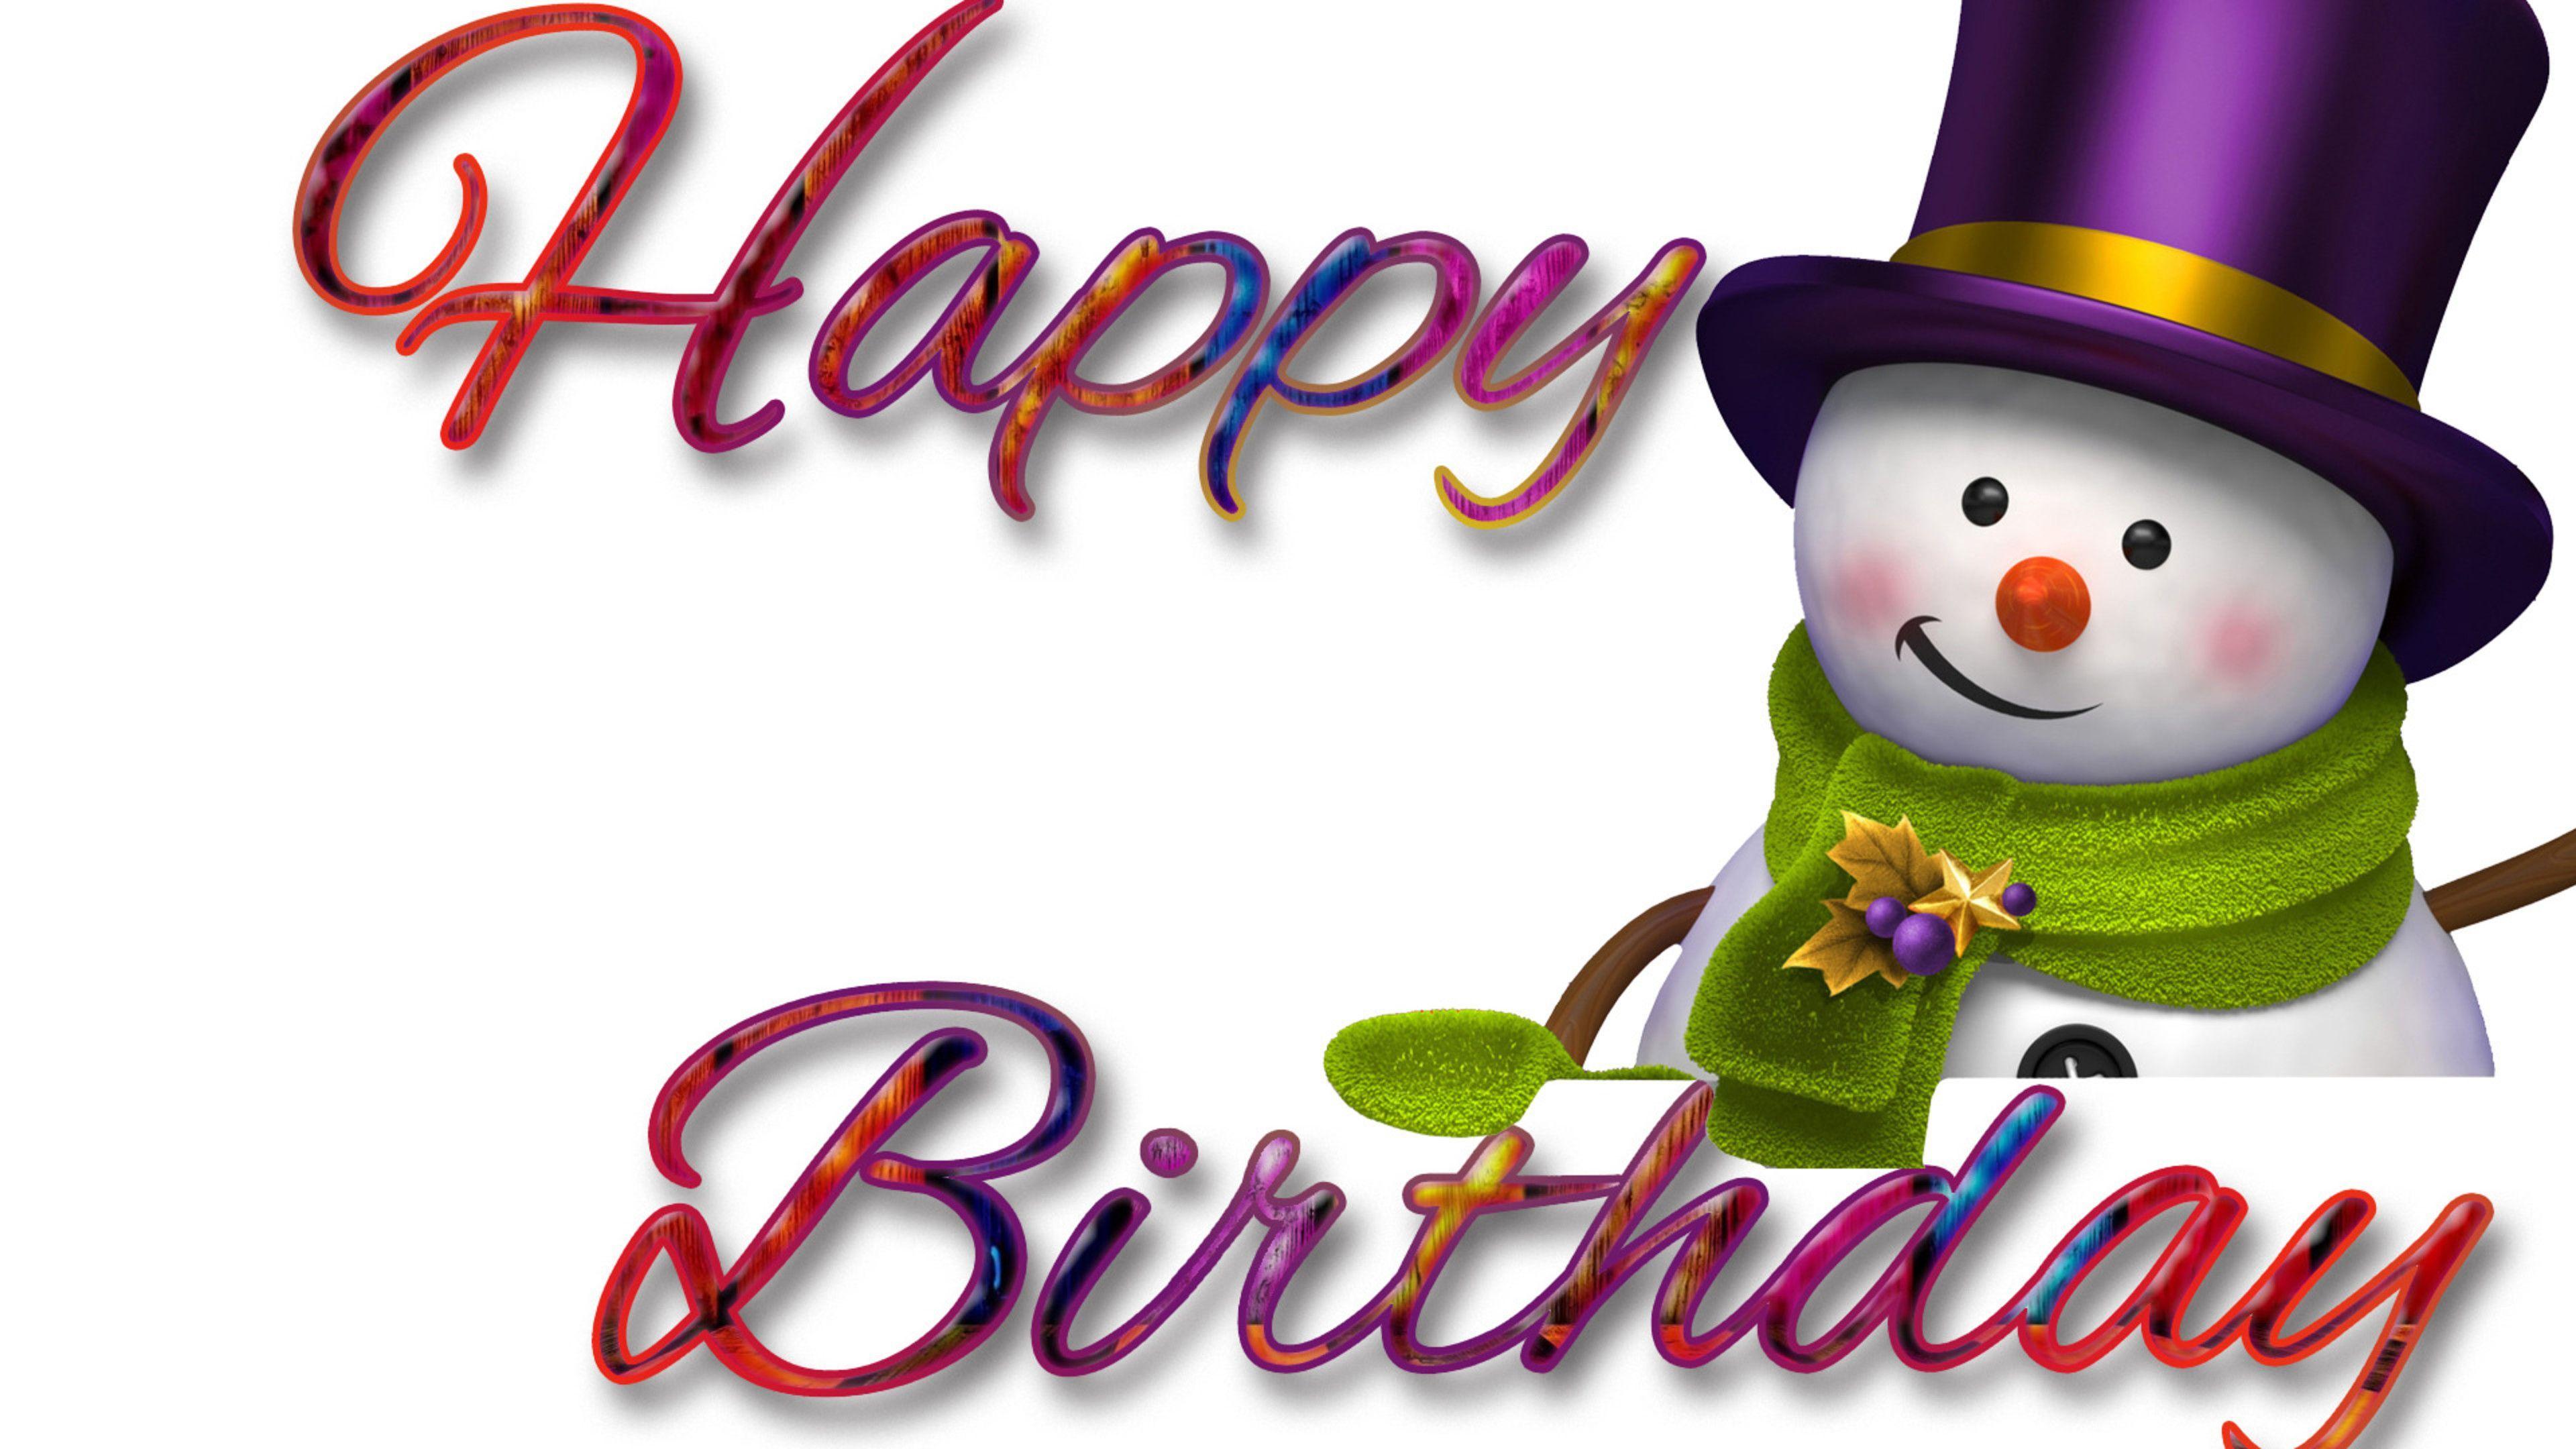 happy birthday pic hd free download happy birthday hd images rh pinterest com Funny Birthday Clip Art Funny Birthday Clip Art